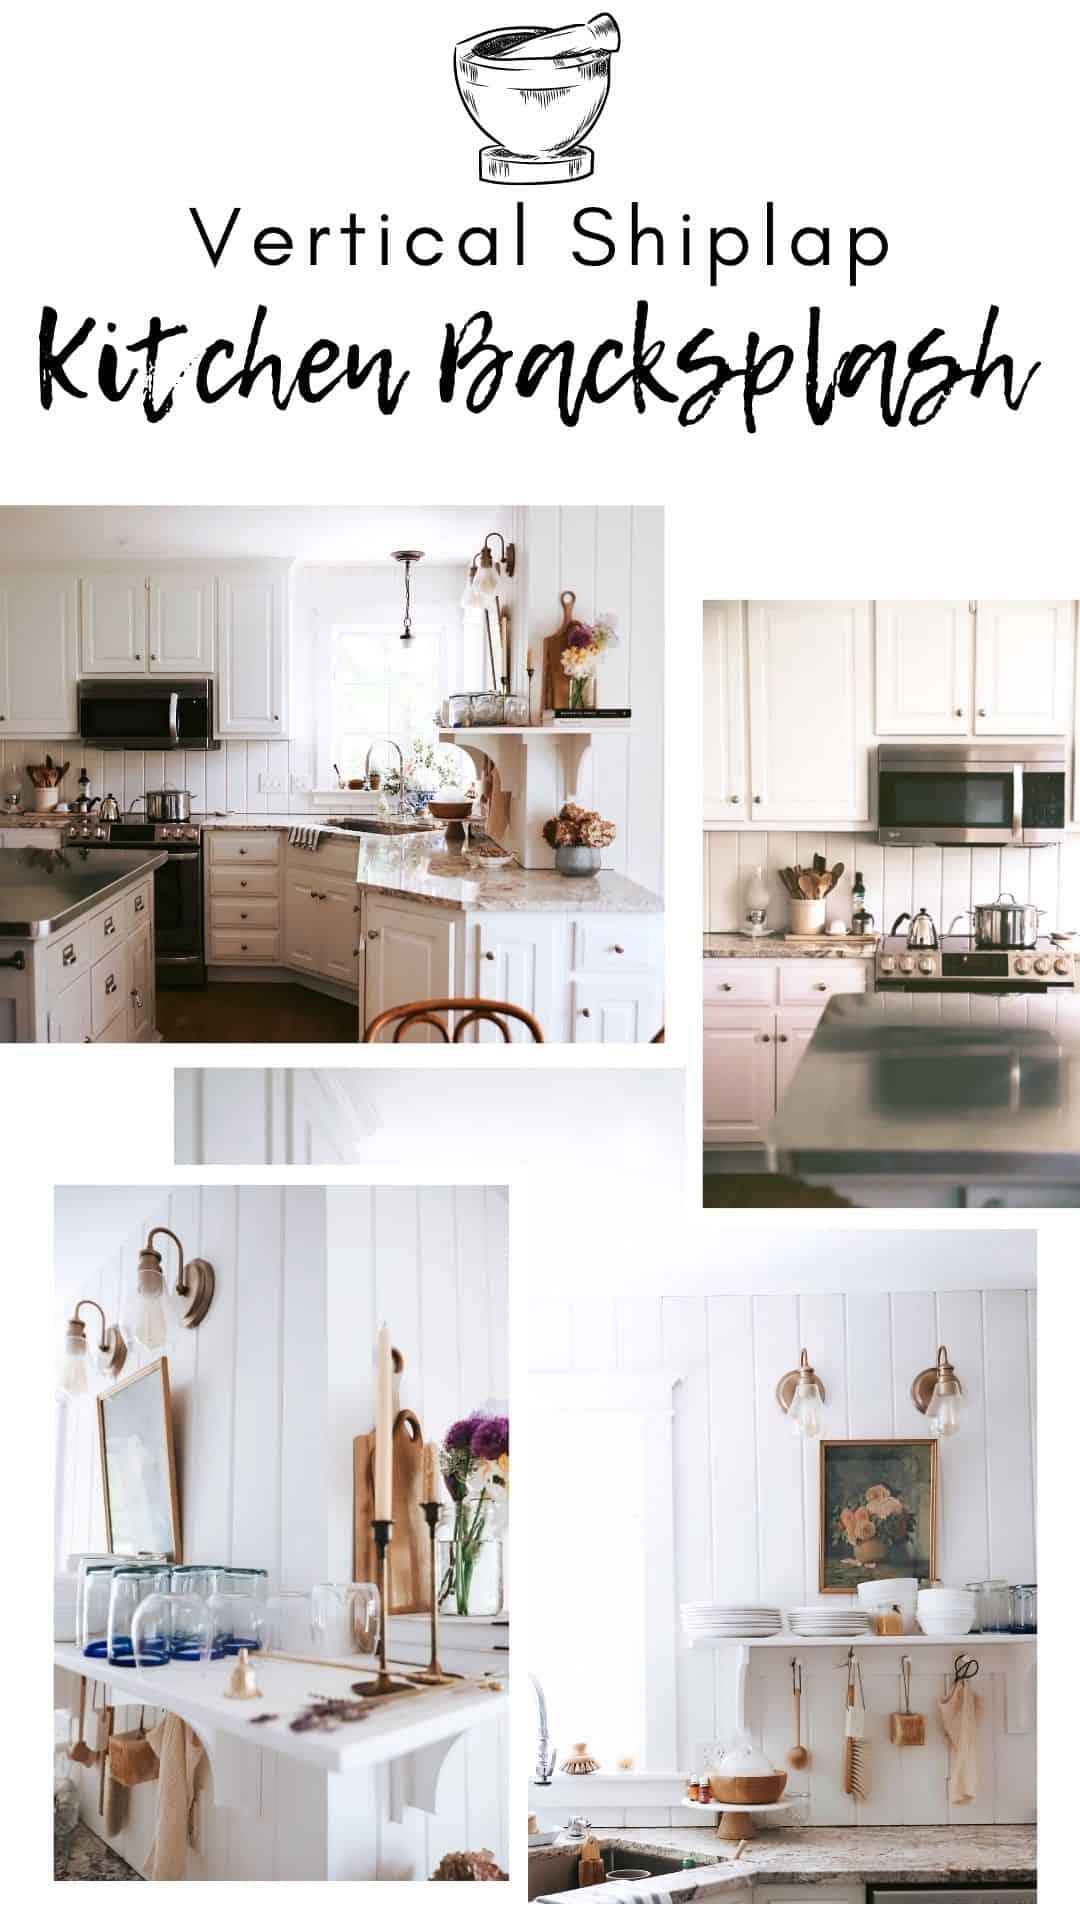 vertical eased-edge kitchen backsplash with open shelving